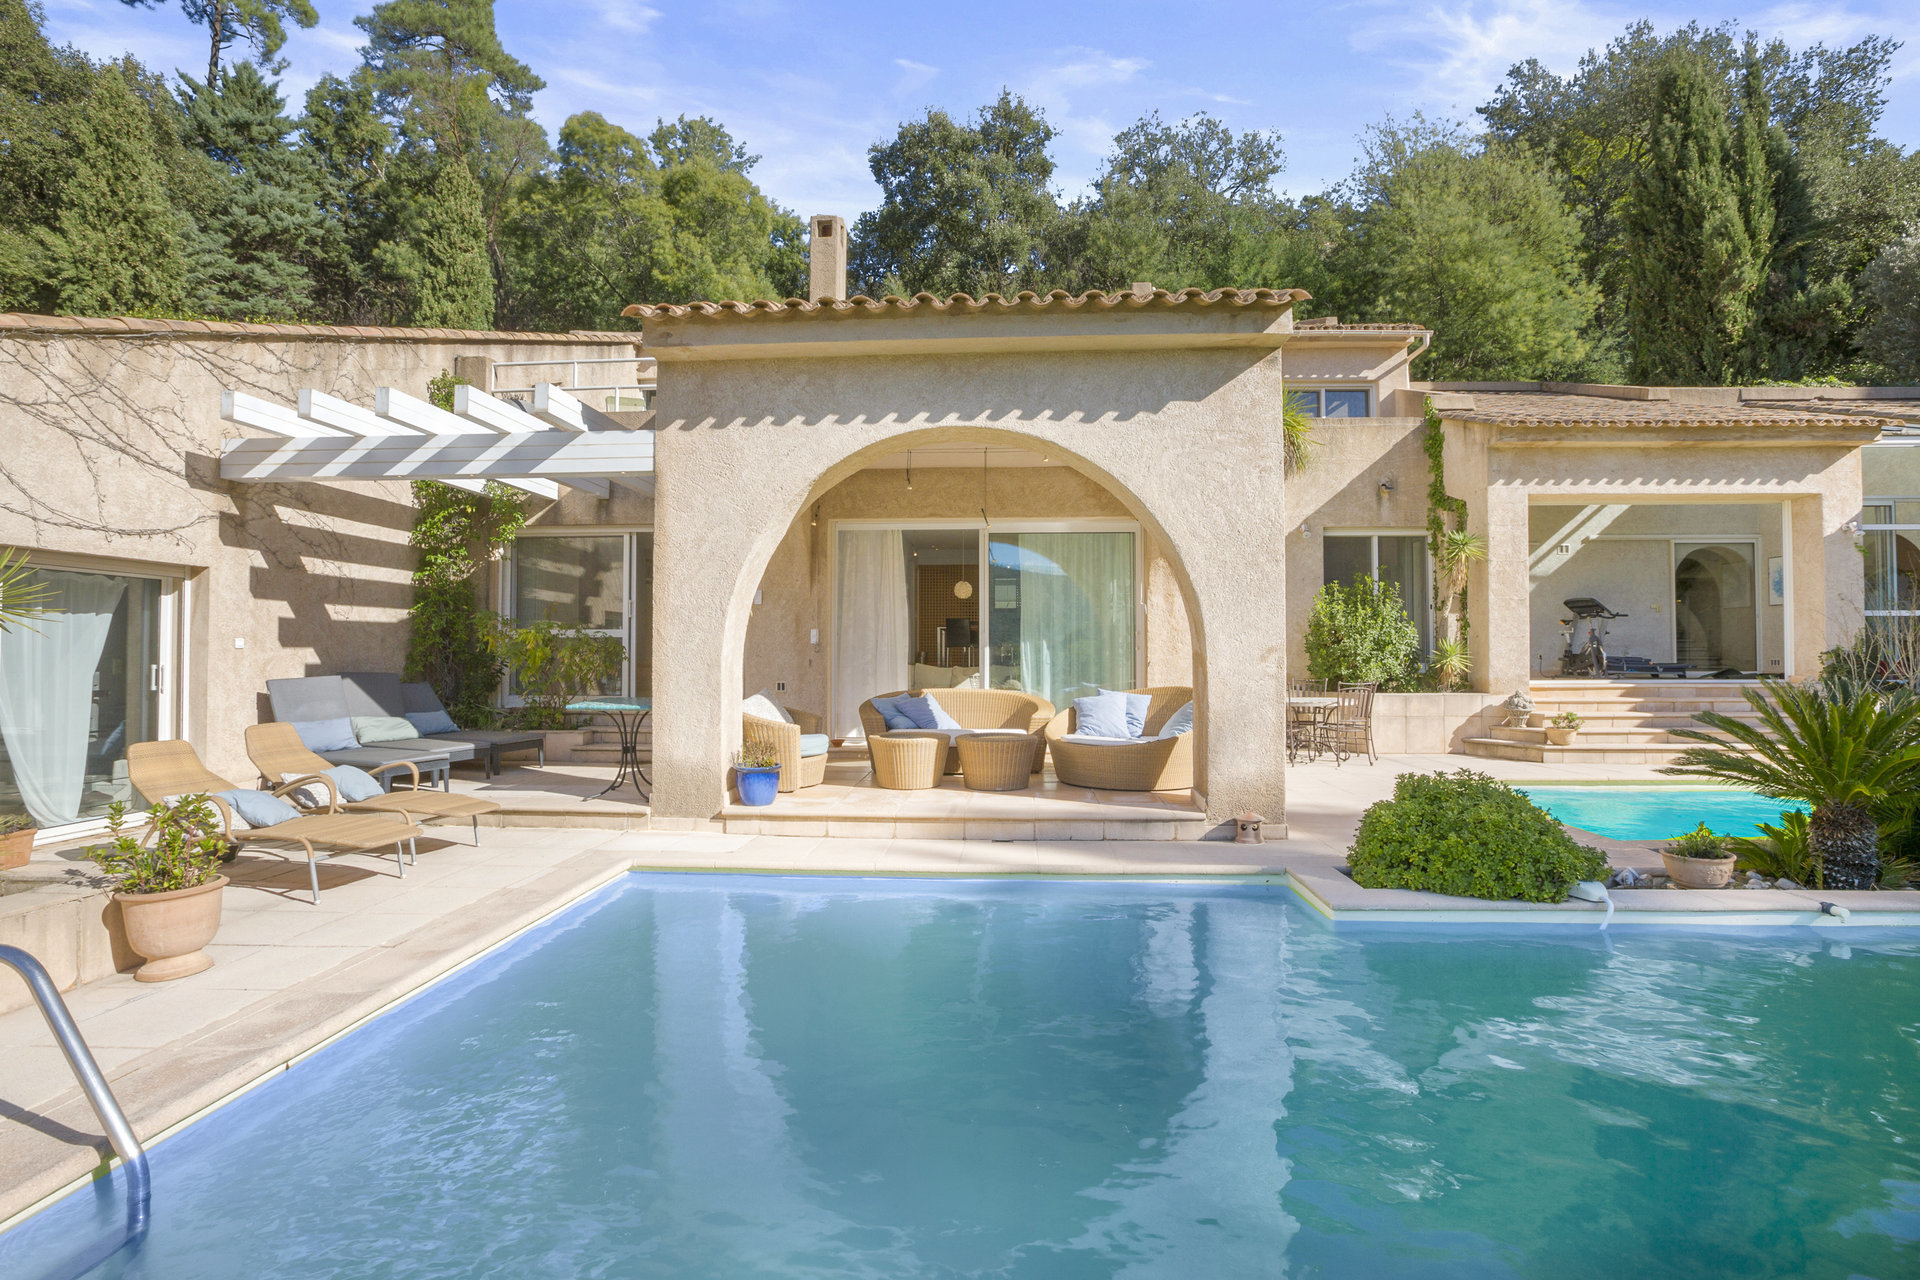 Exceptionnel, cadre idyllique proche Cannes